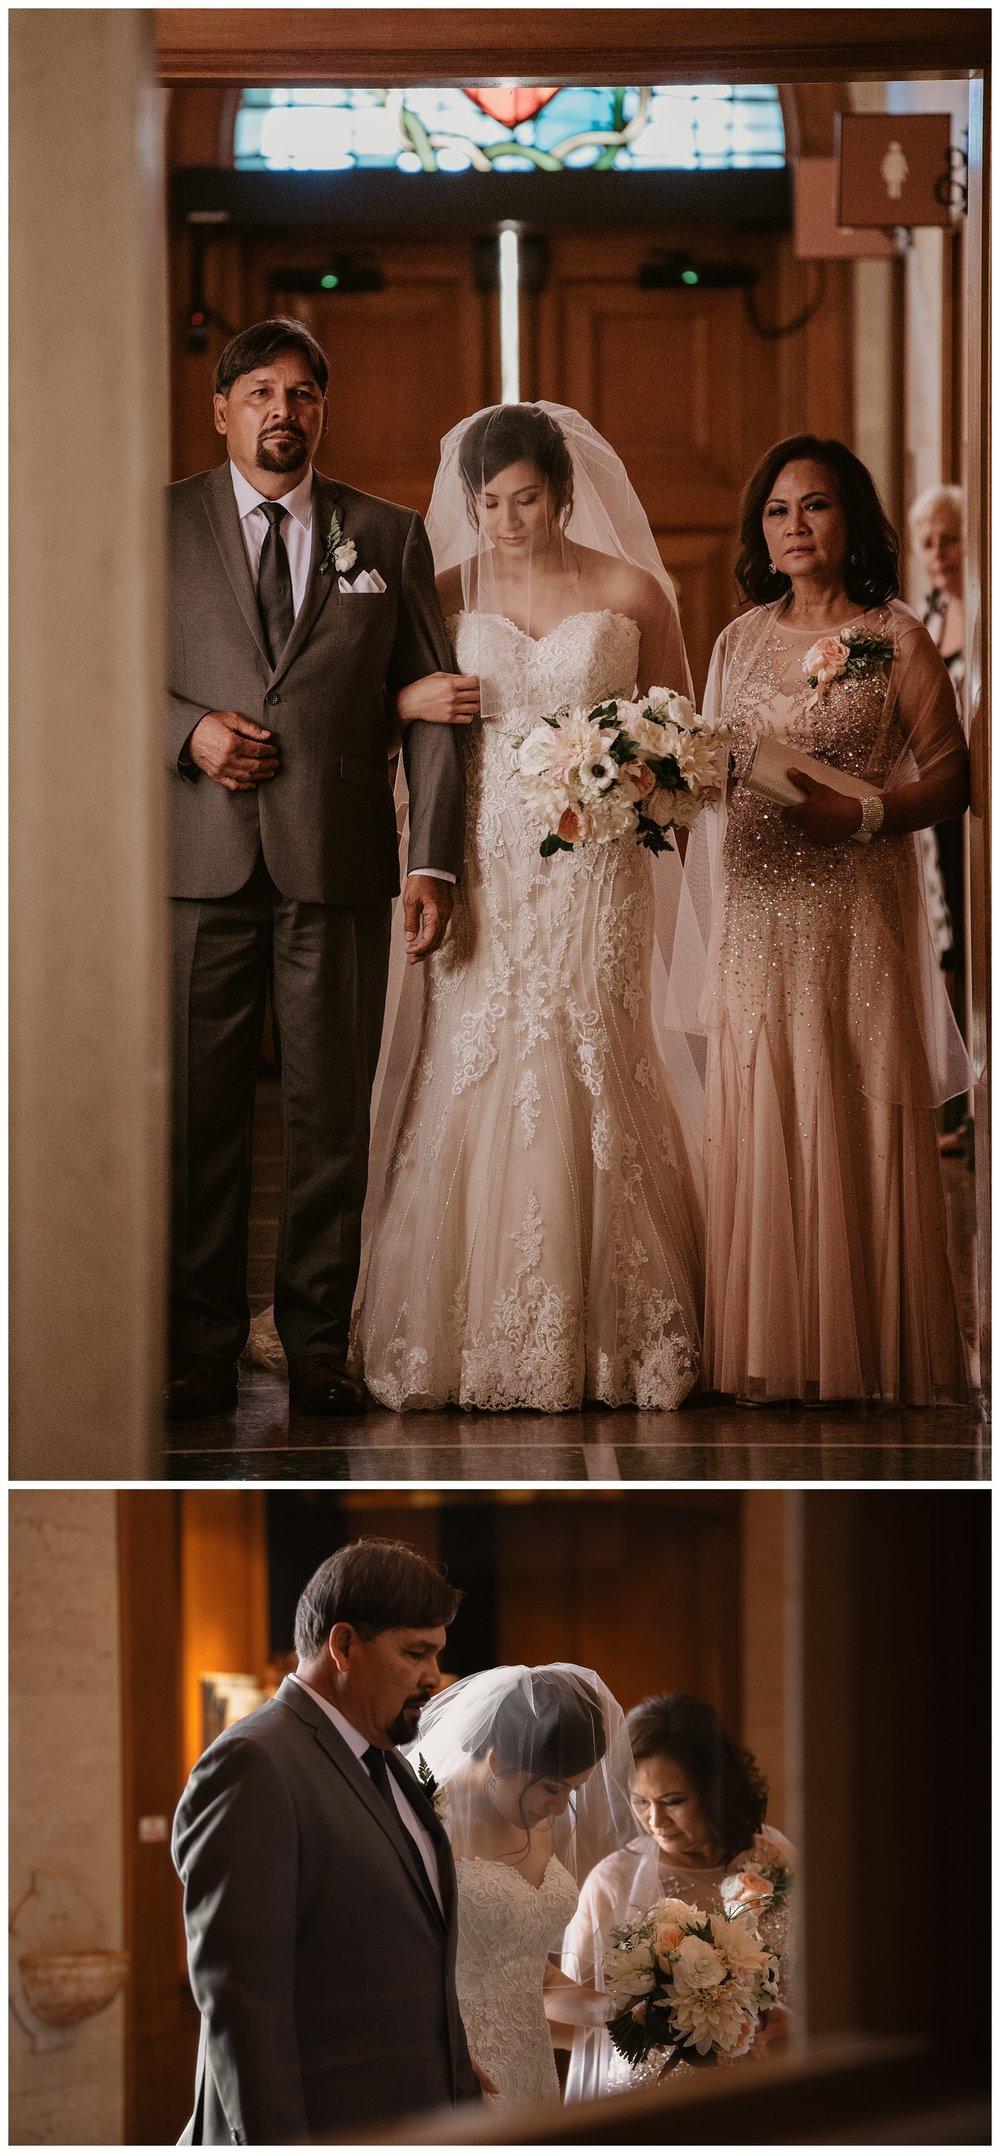 Brick_San_Diego_wedding_0018.jpg